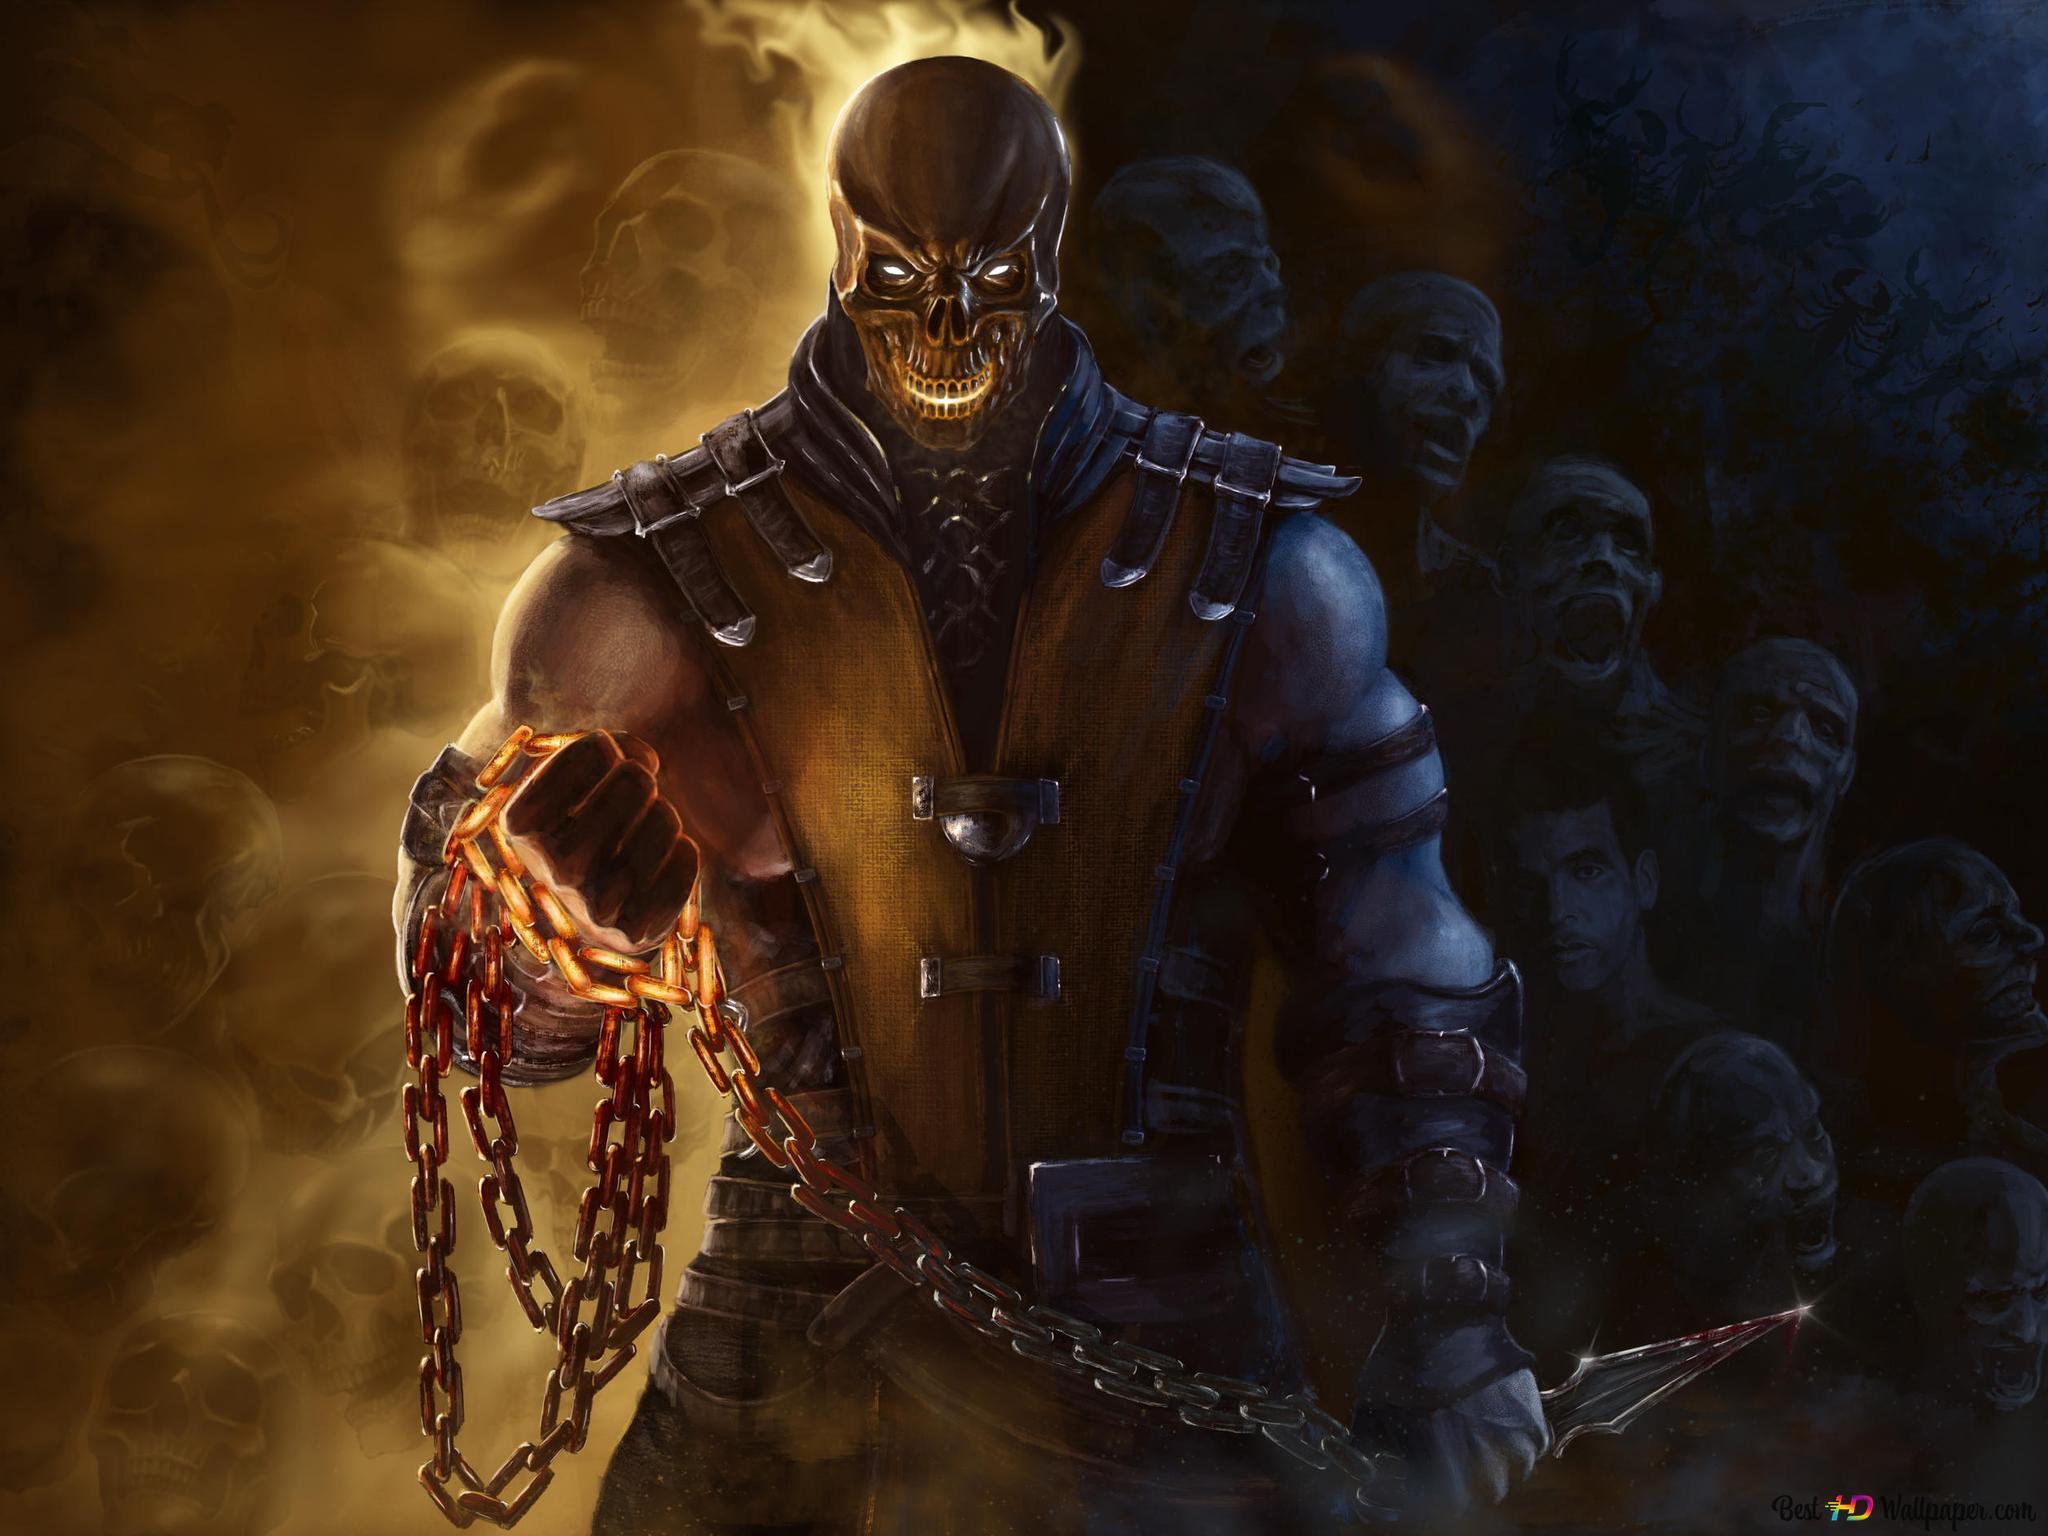 Mortal Kombat X Scorpion Fanart Hd Wallpaper Download